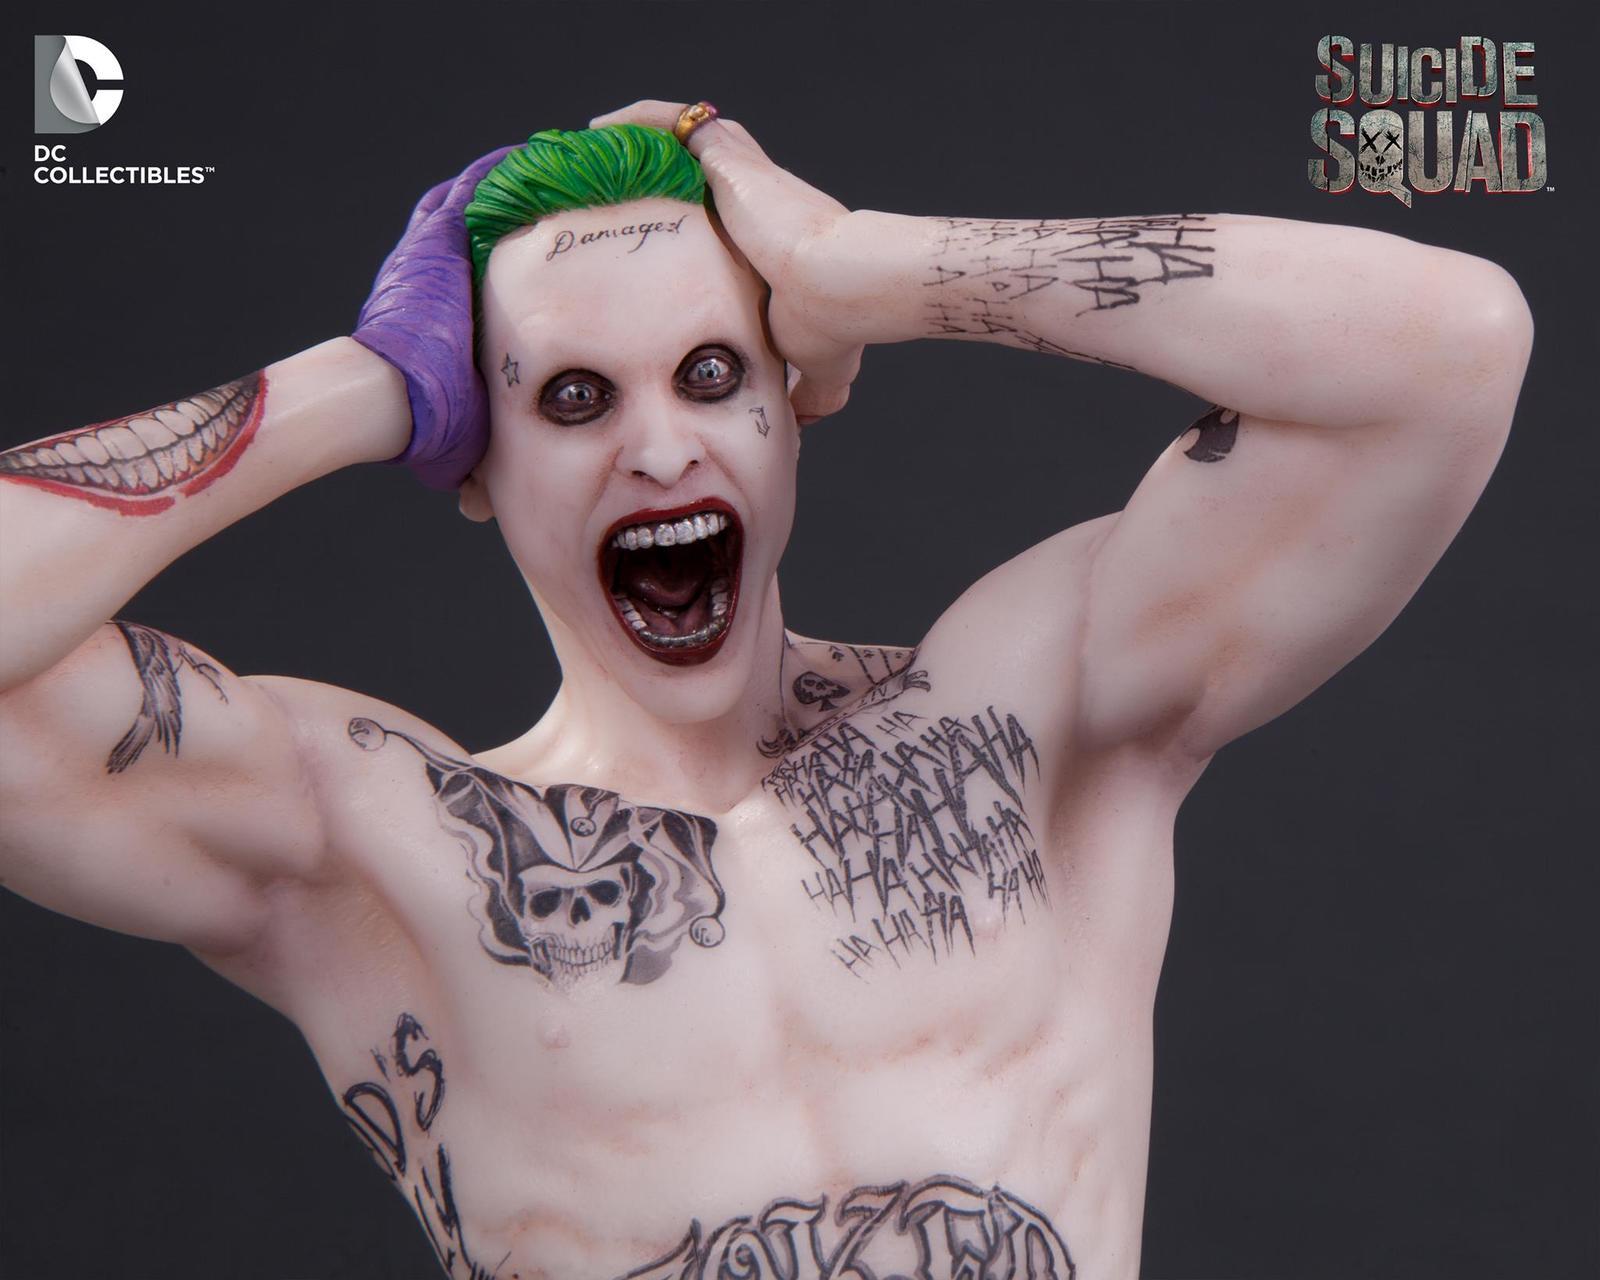 Suicide Squad - The Joker Statue image